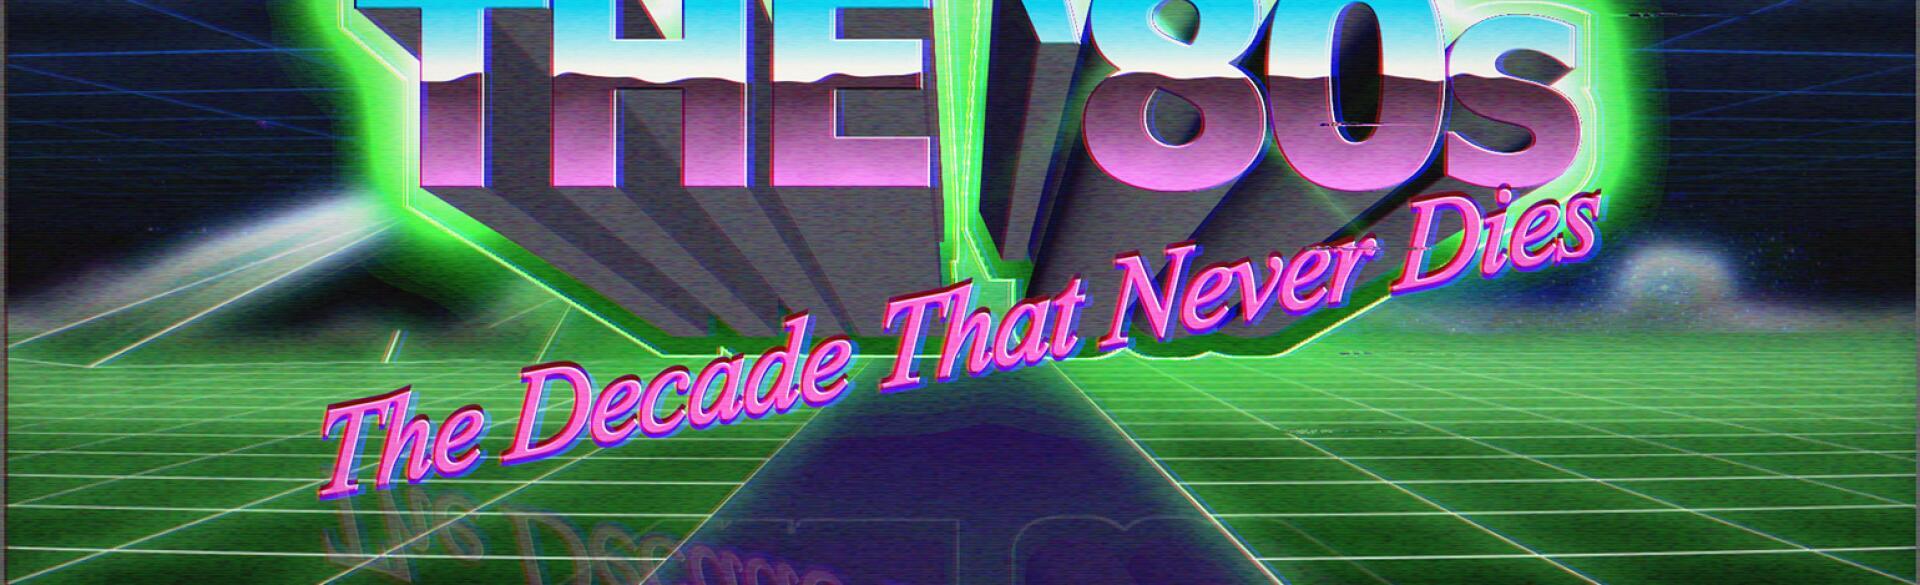 1980s, The girlfriend, AARP, The Best Decade